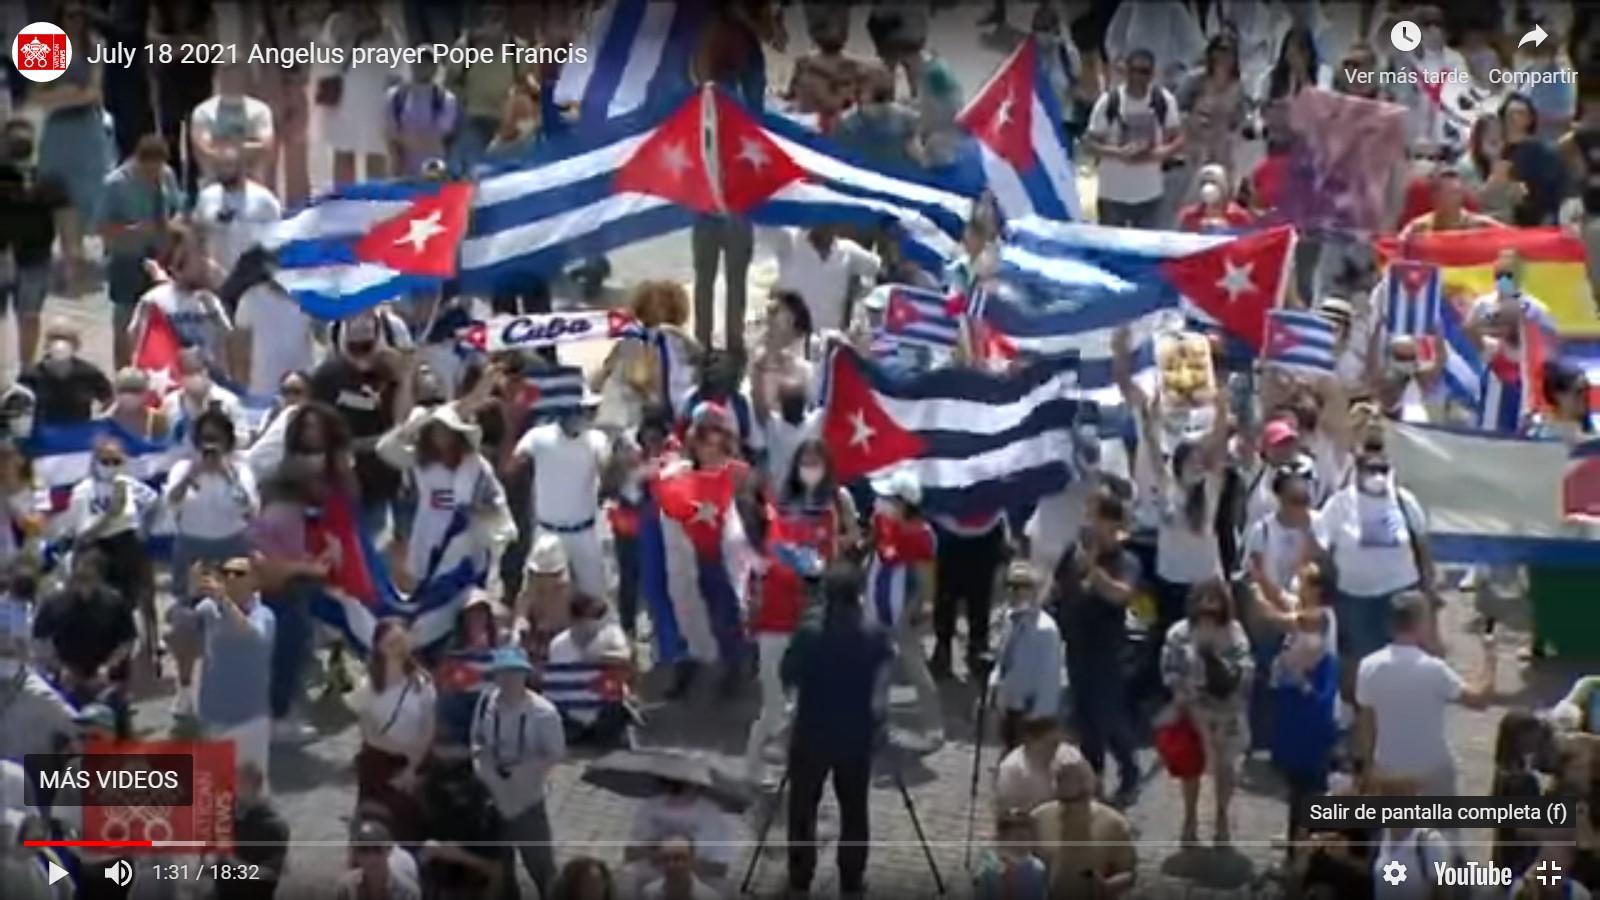 Cuba Angelus 18 julio 2021